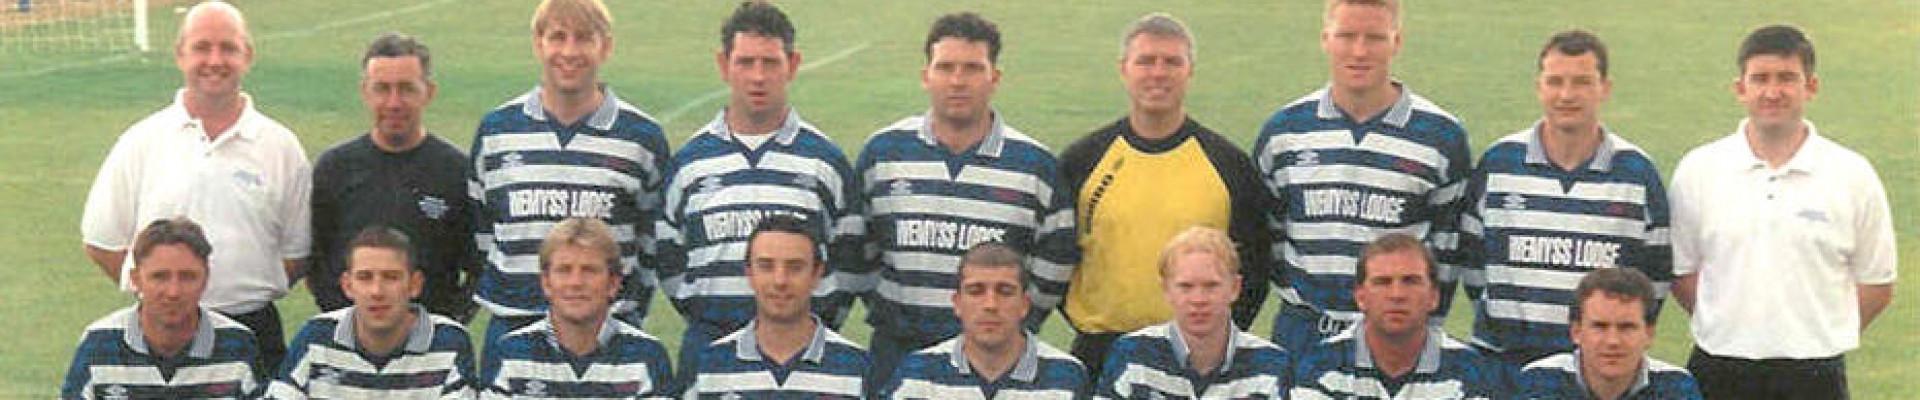 Team Photo 1998/99 Season